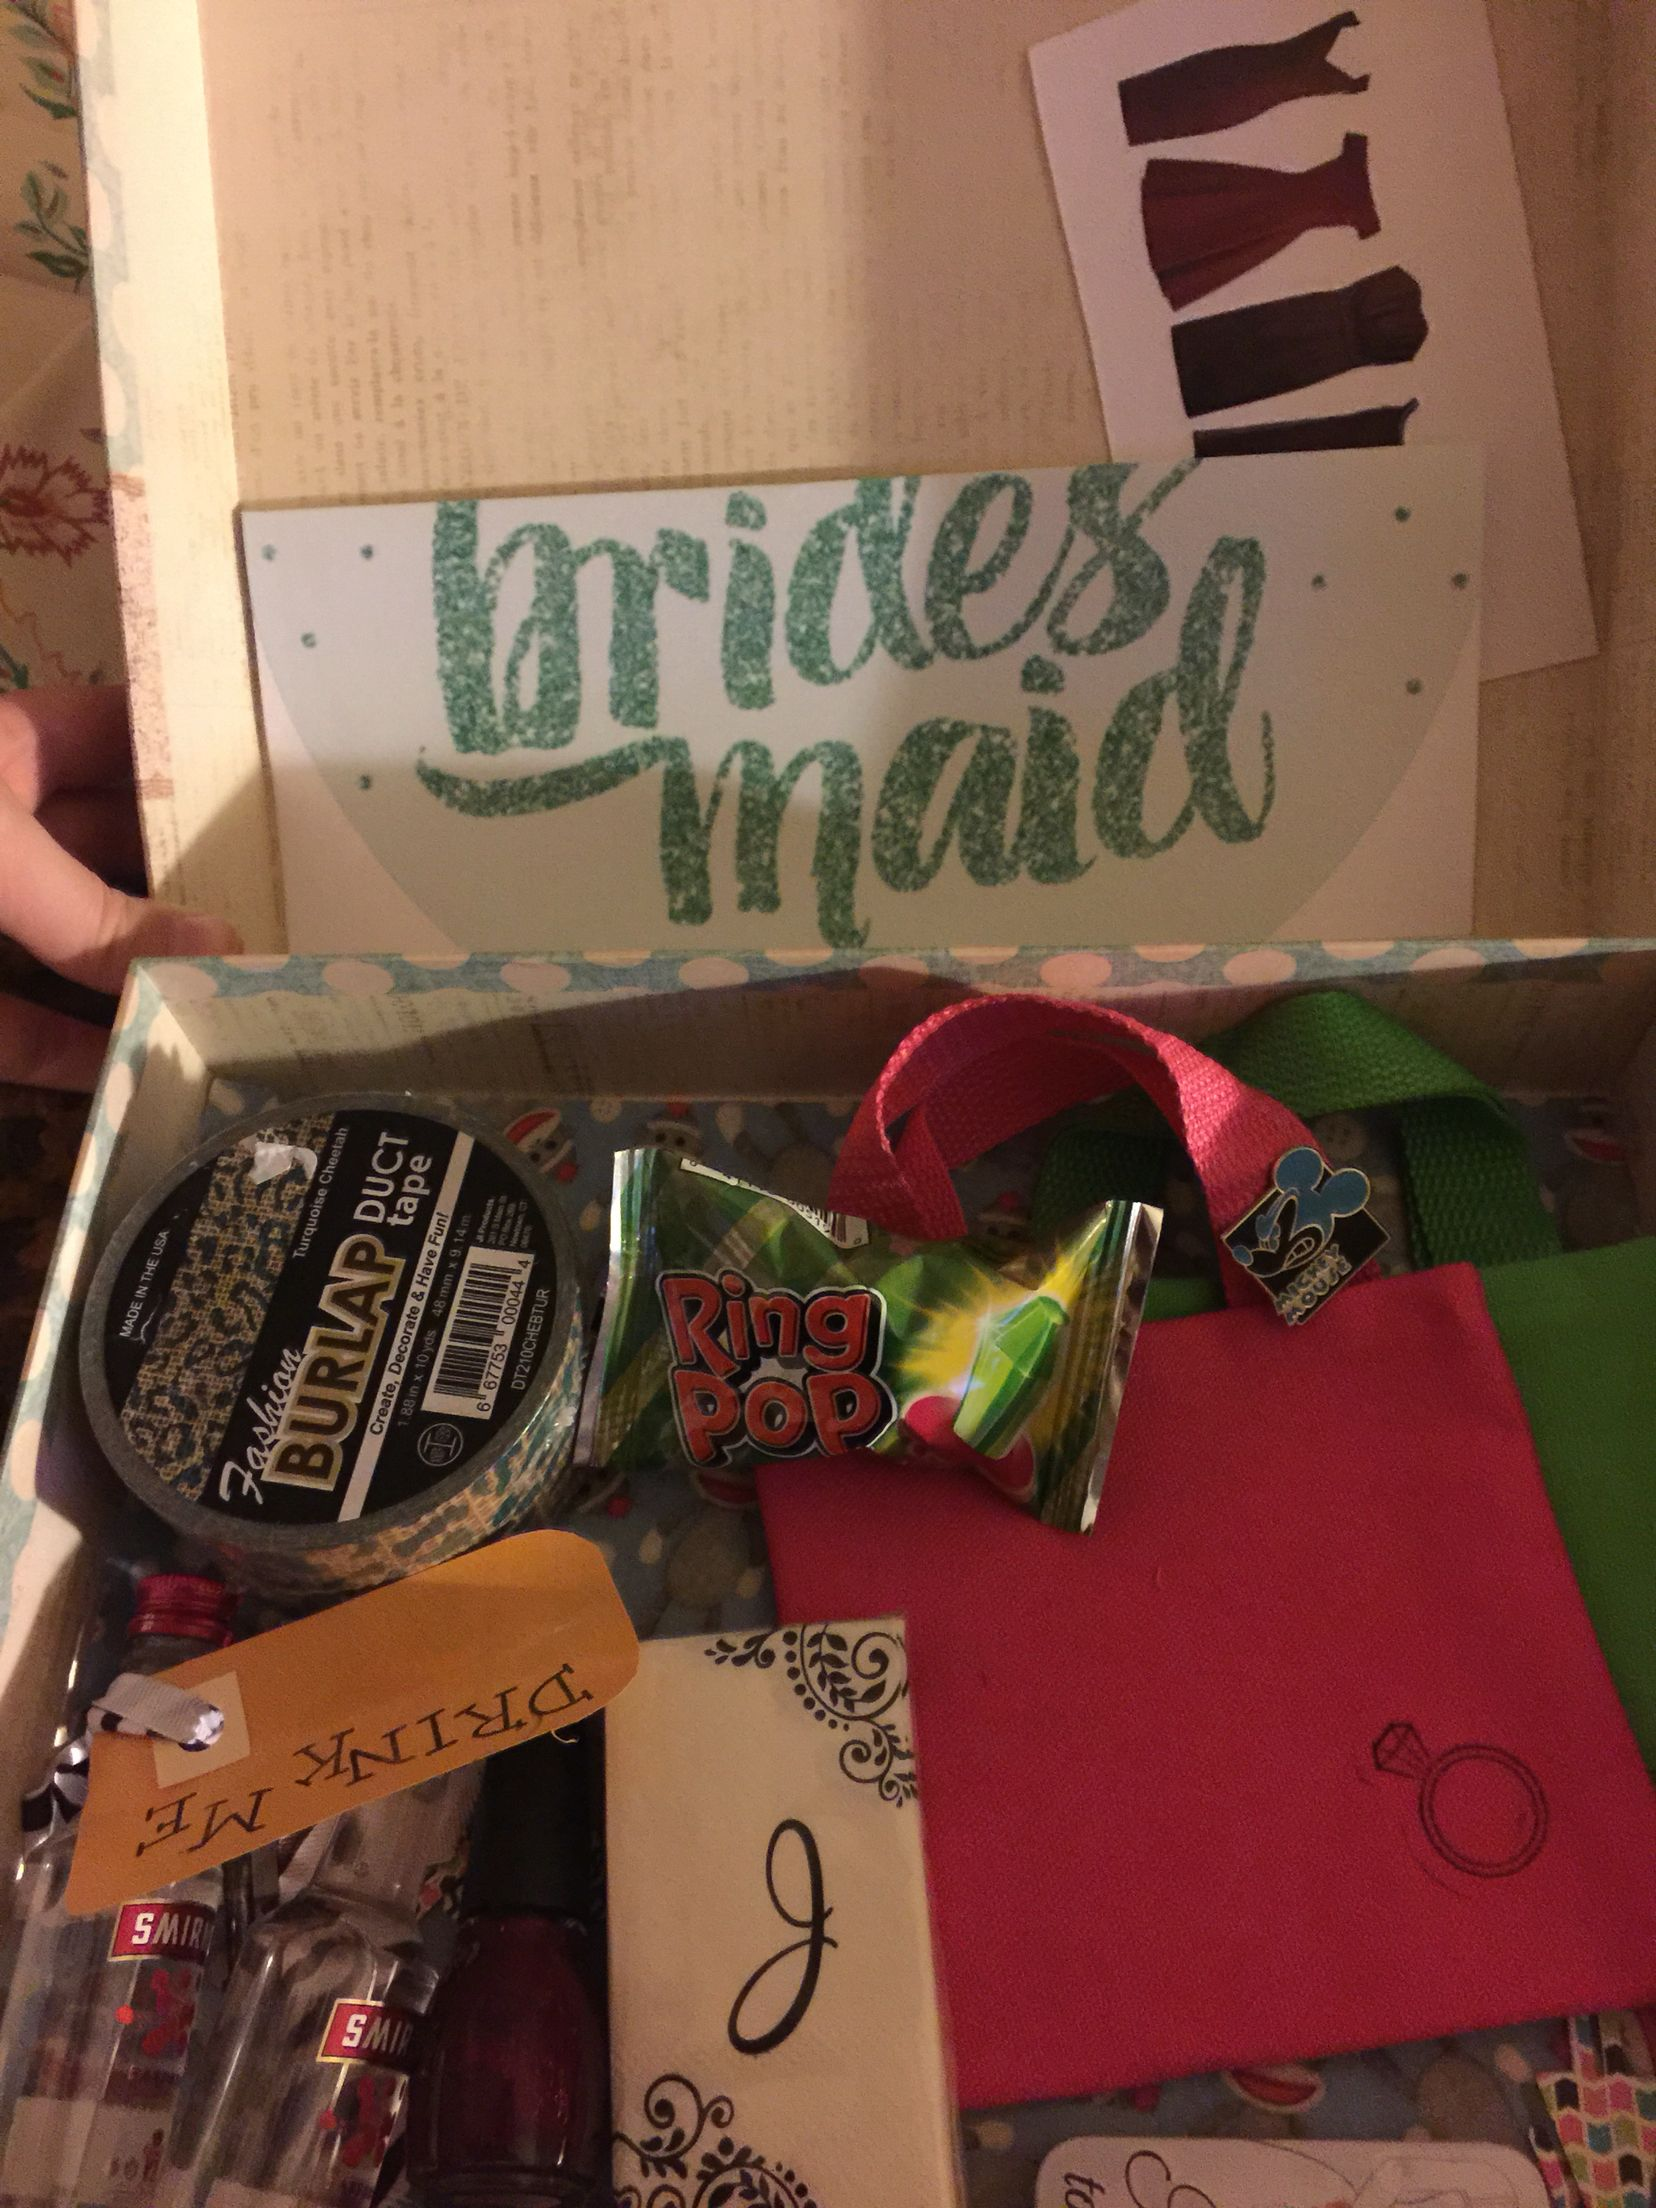 My bridesmaid box I made for my best friend. #bestfriend#bridesmaidbox#box#wedding